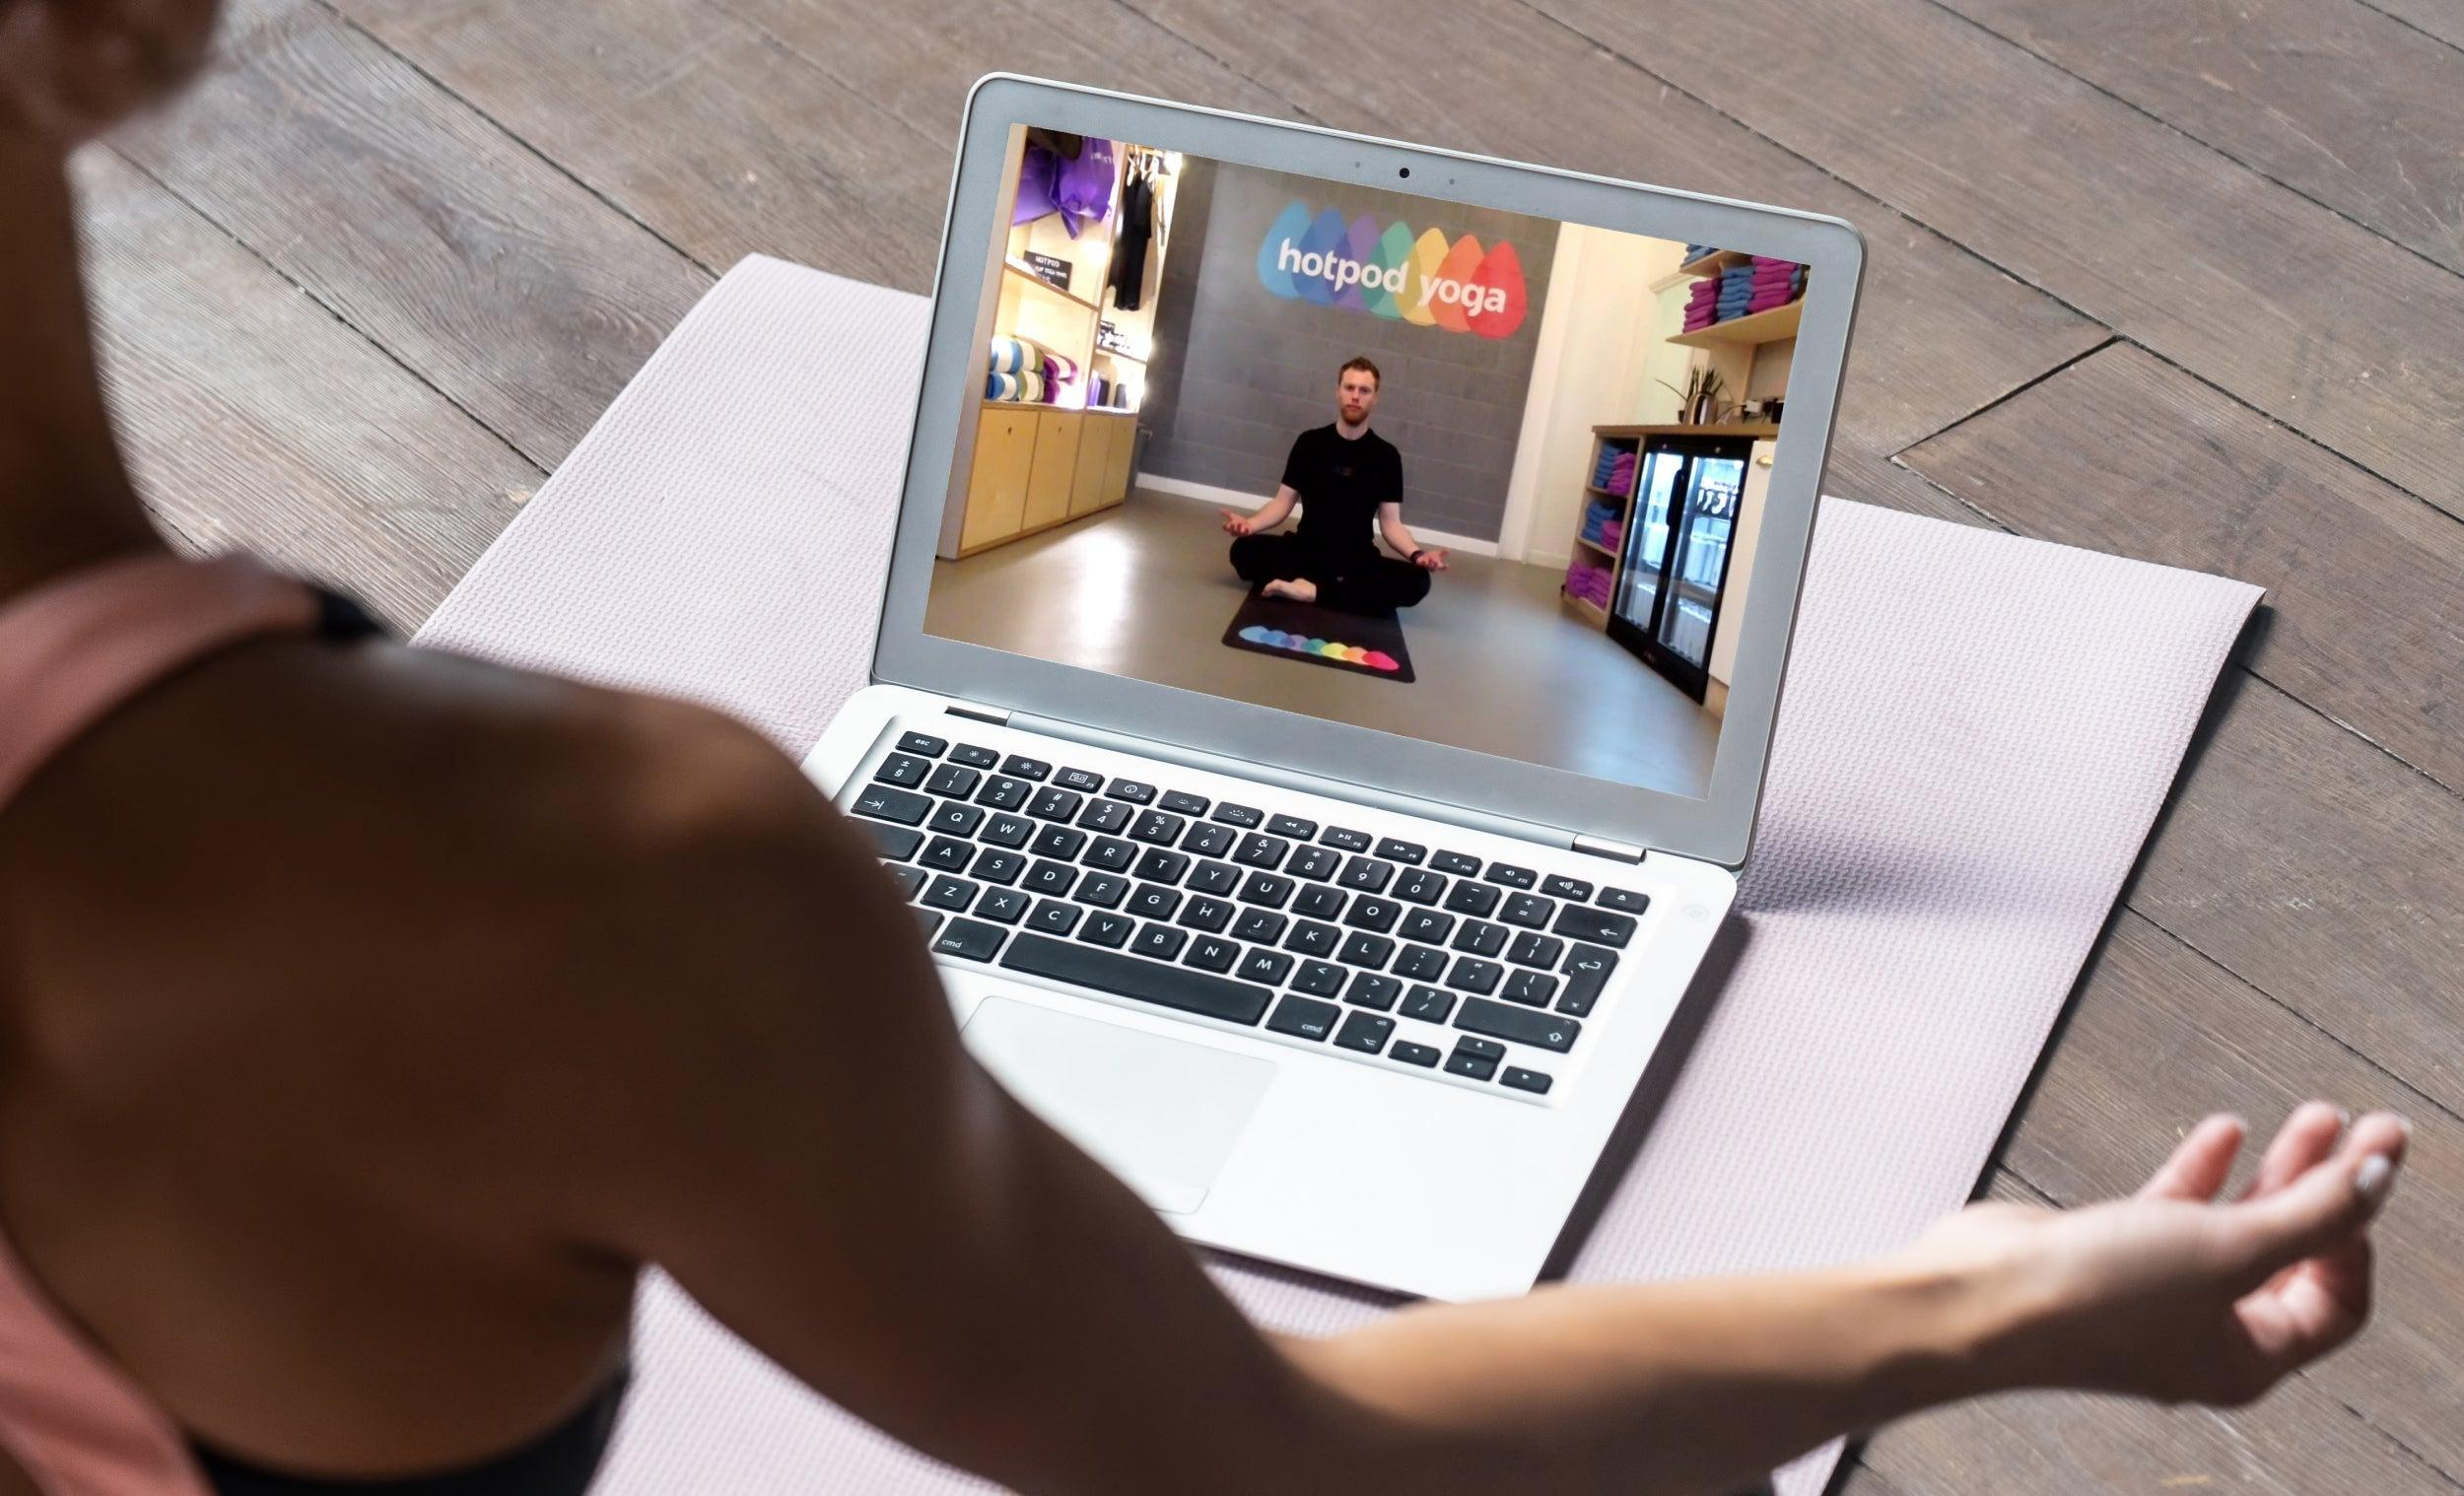 hotpod-yoga